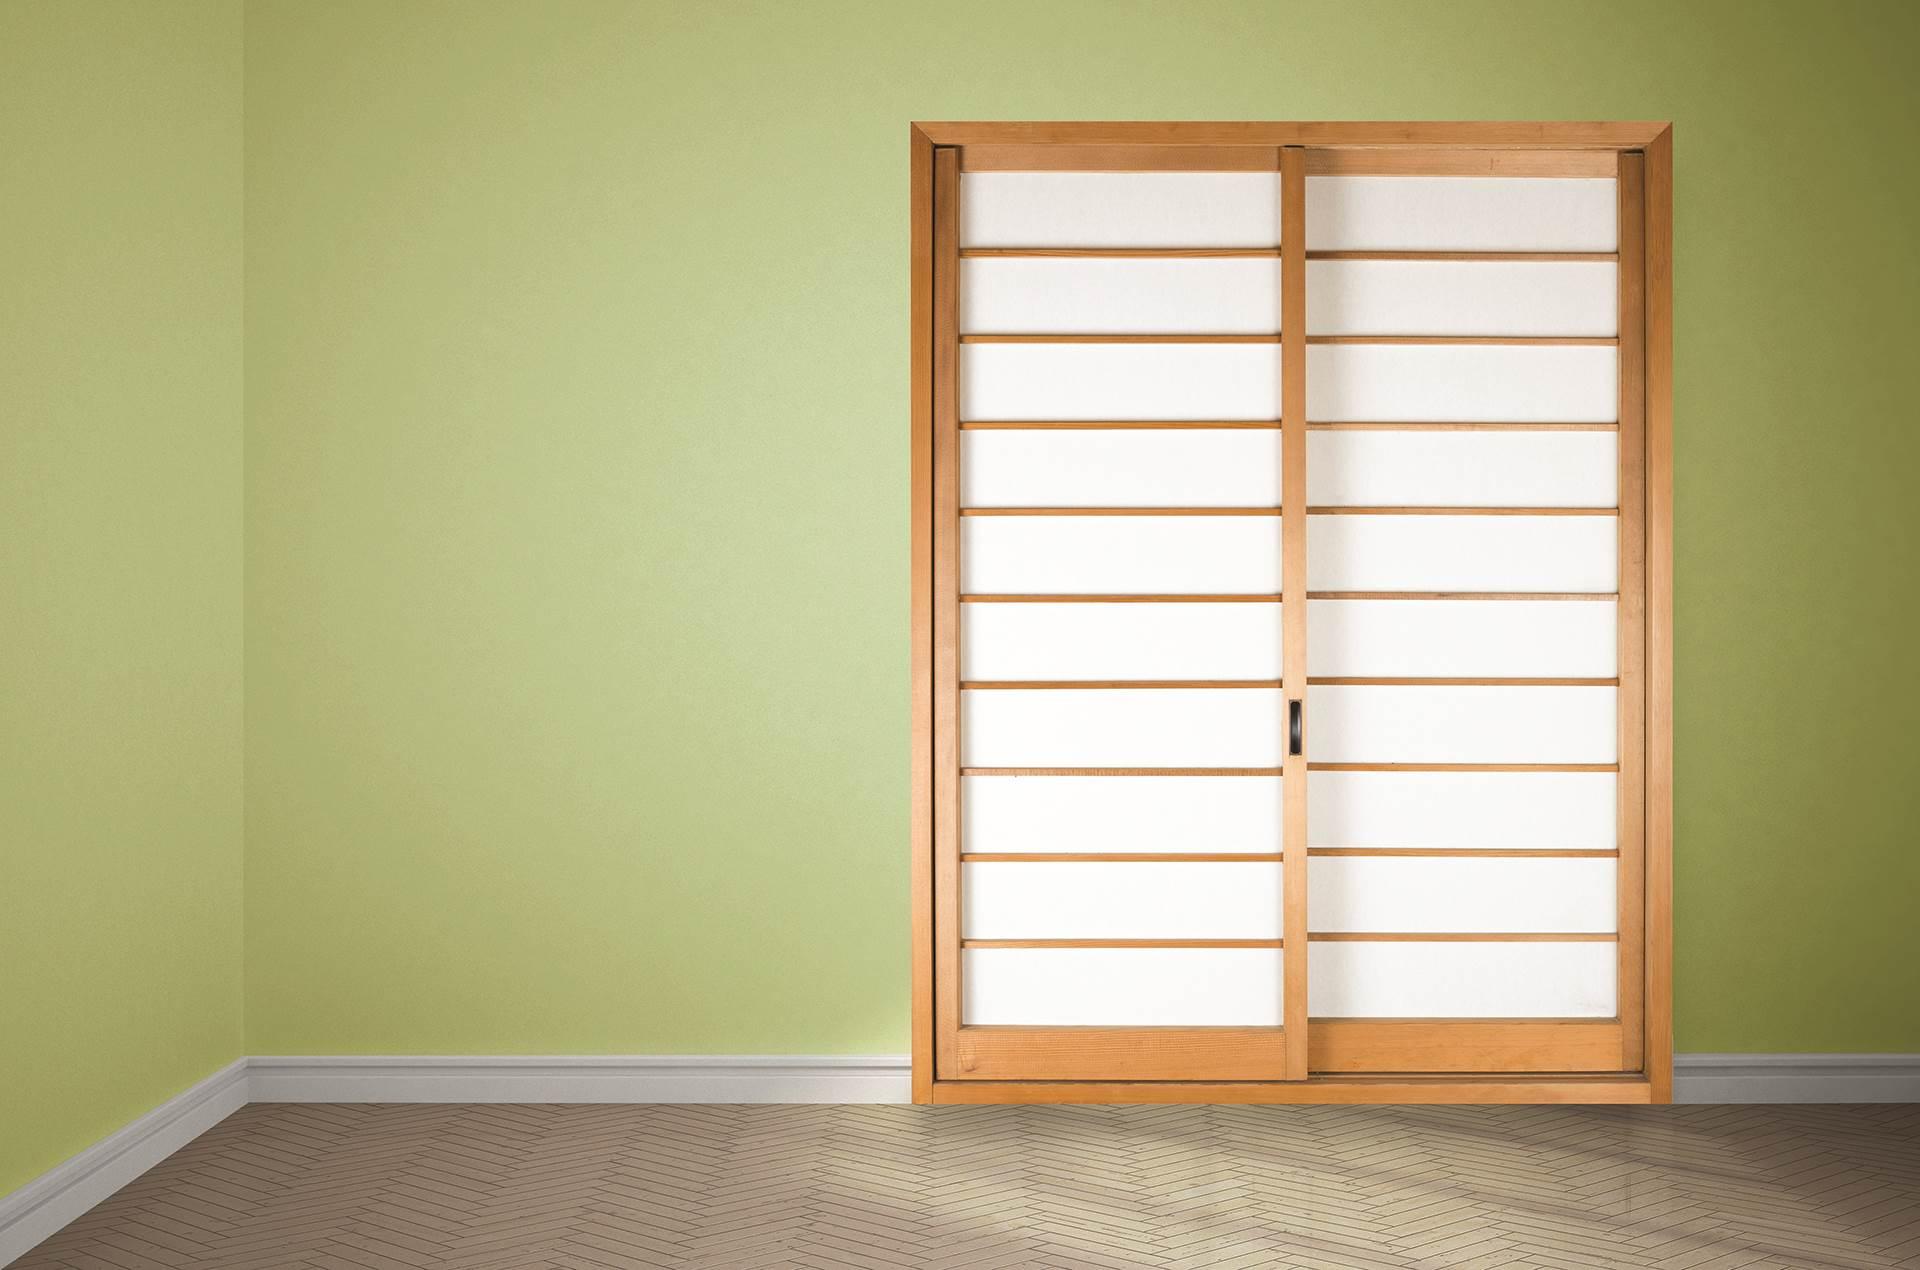 Sliding Door Kits mercial & Domestic Use